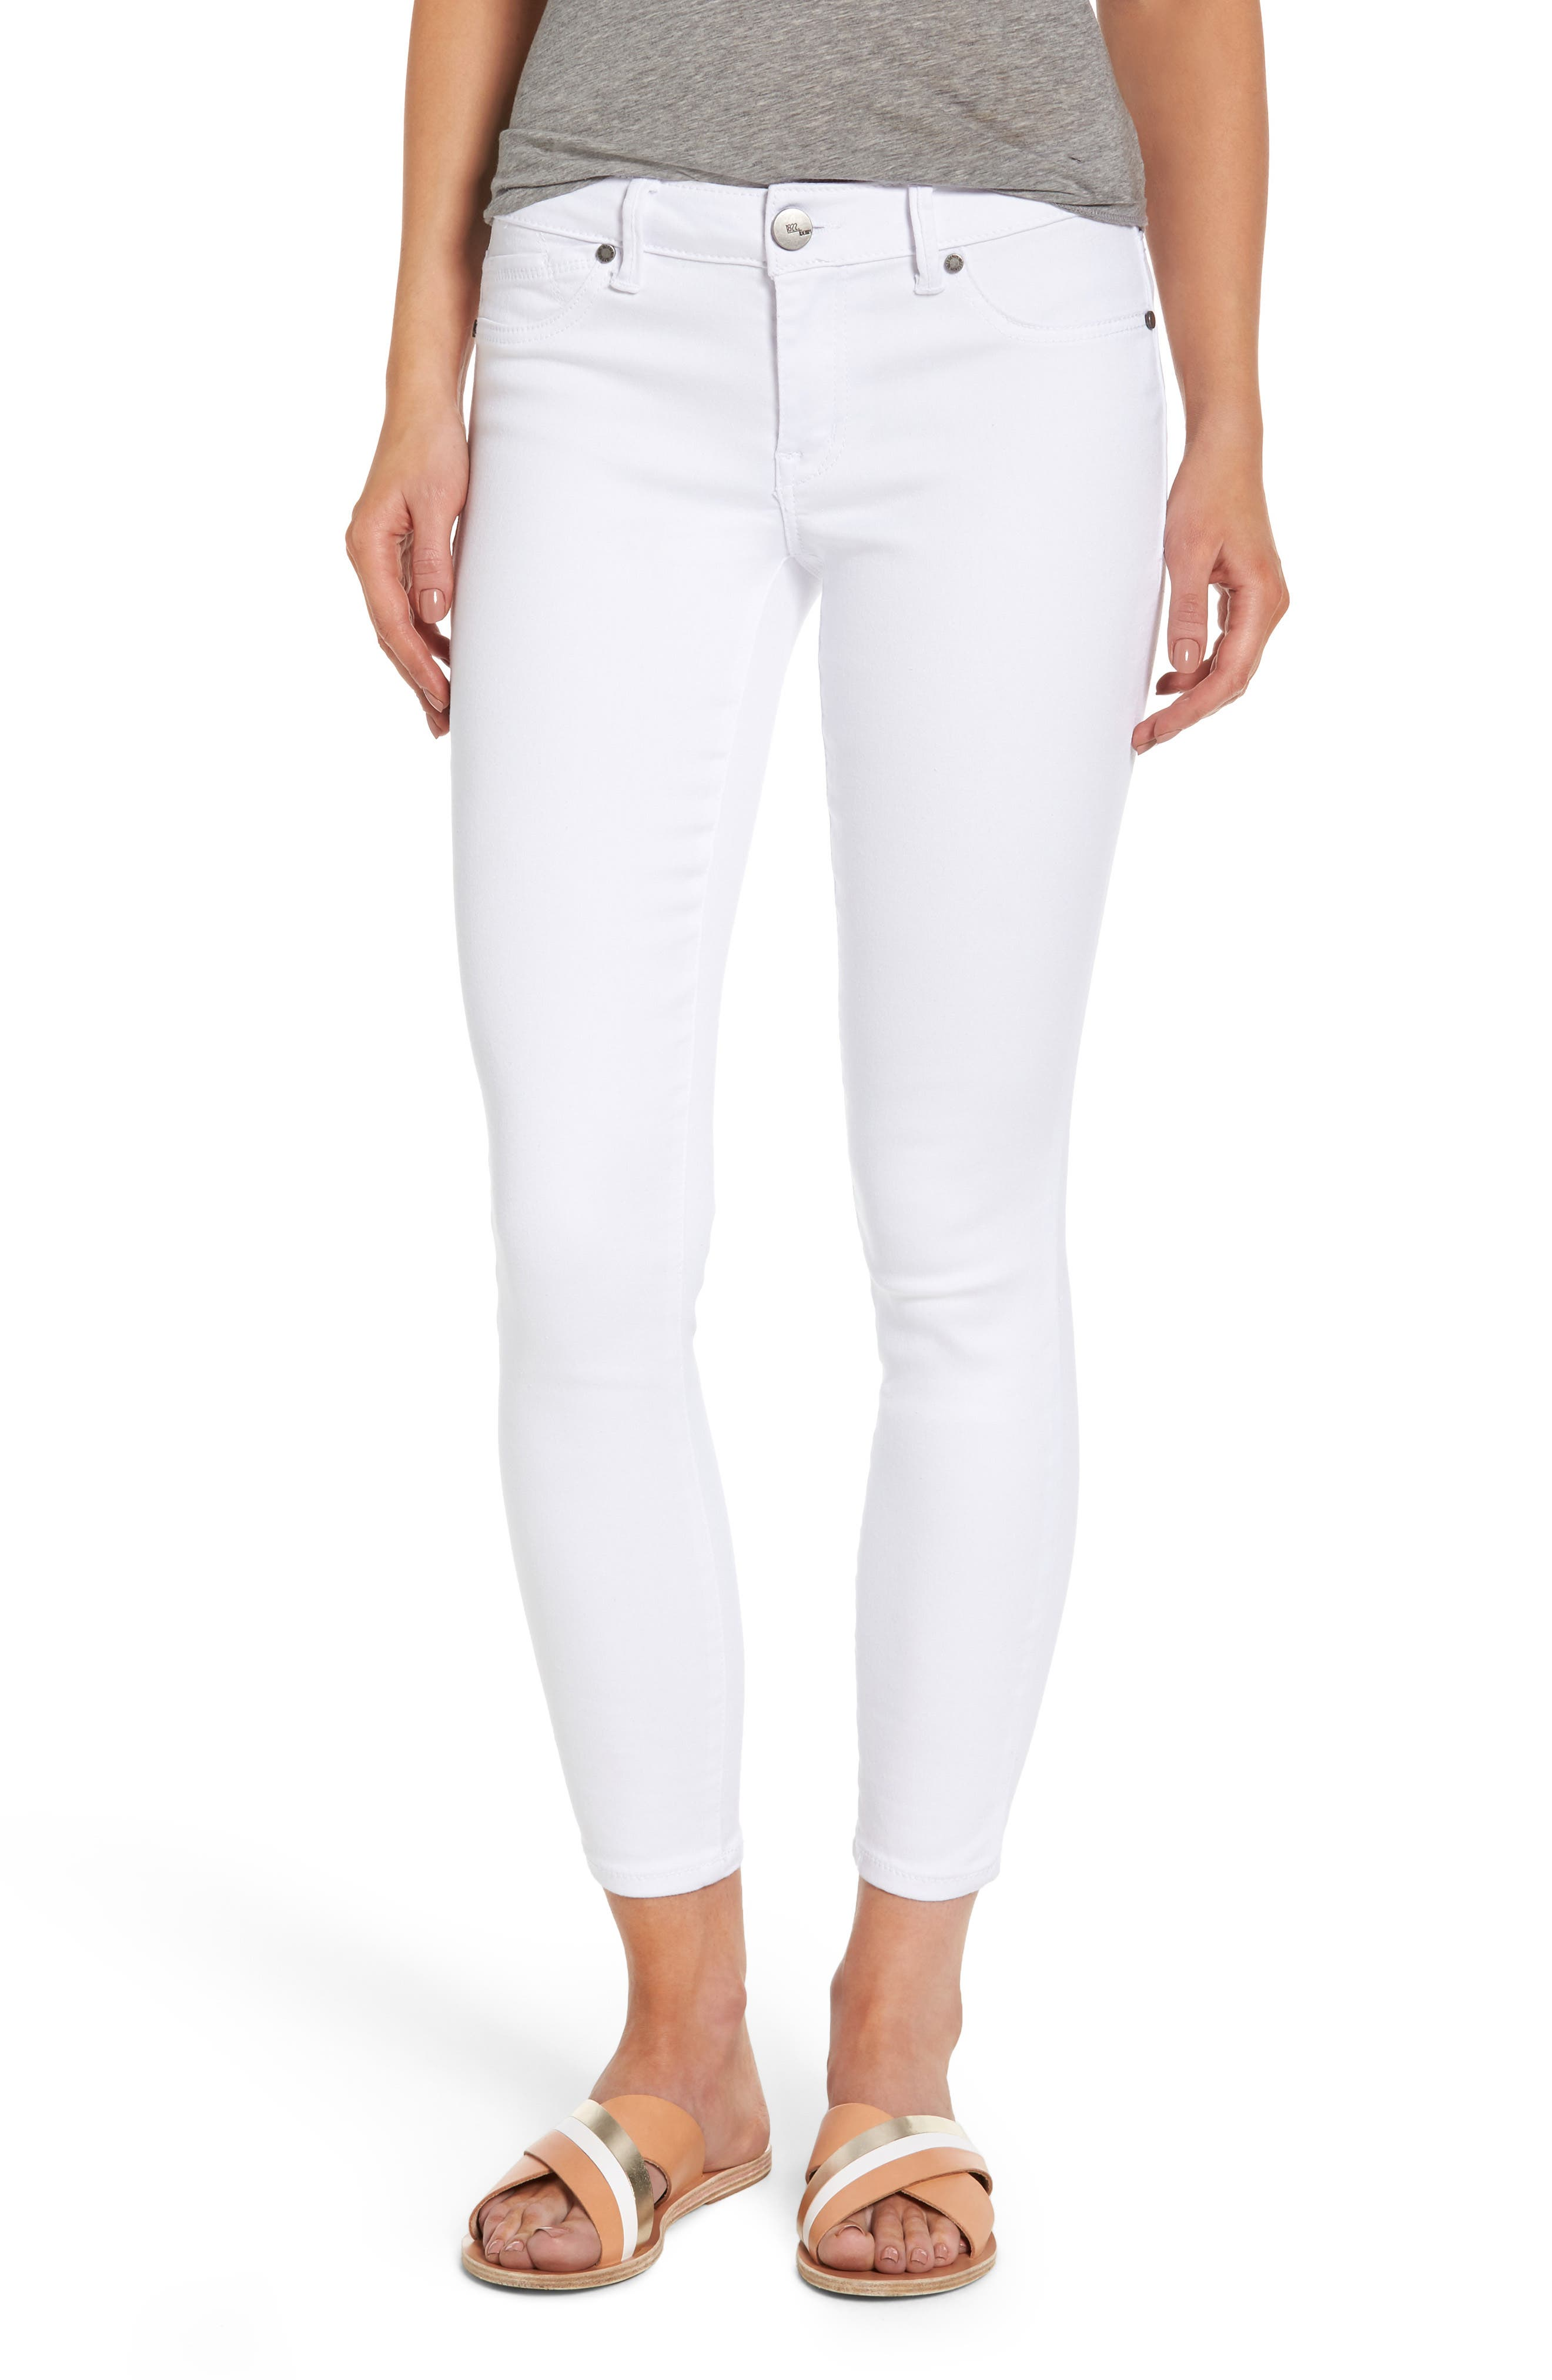 1822 Butter Skinny Jeans